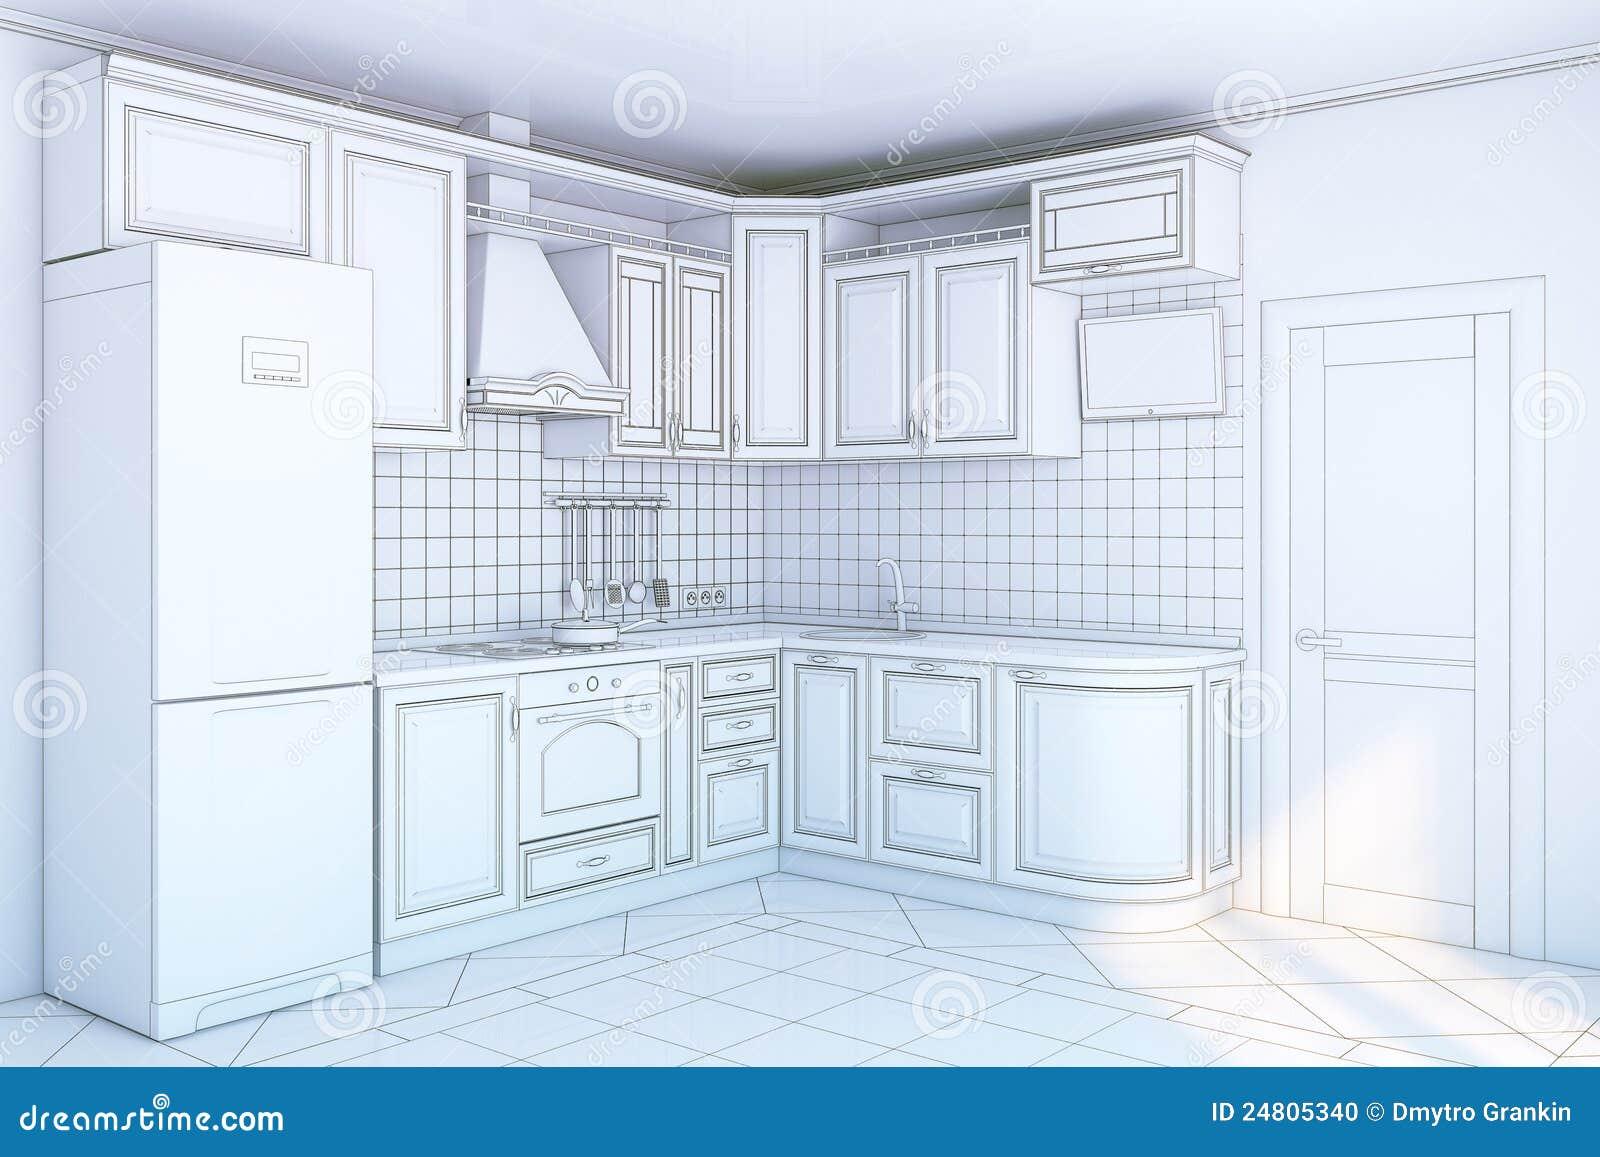 Kitchen Cabinets In Interior Stock Illustration